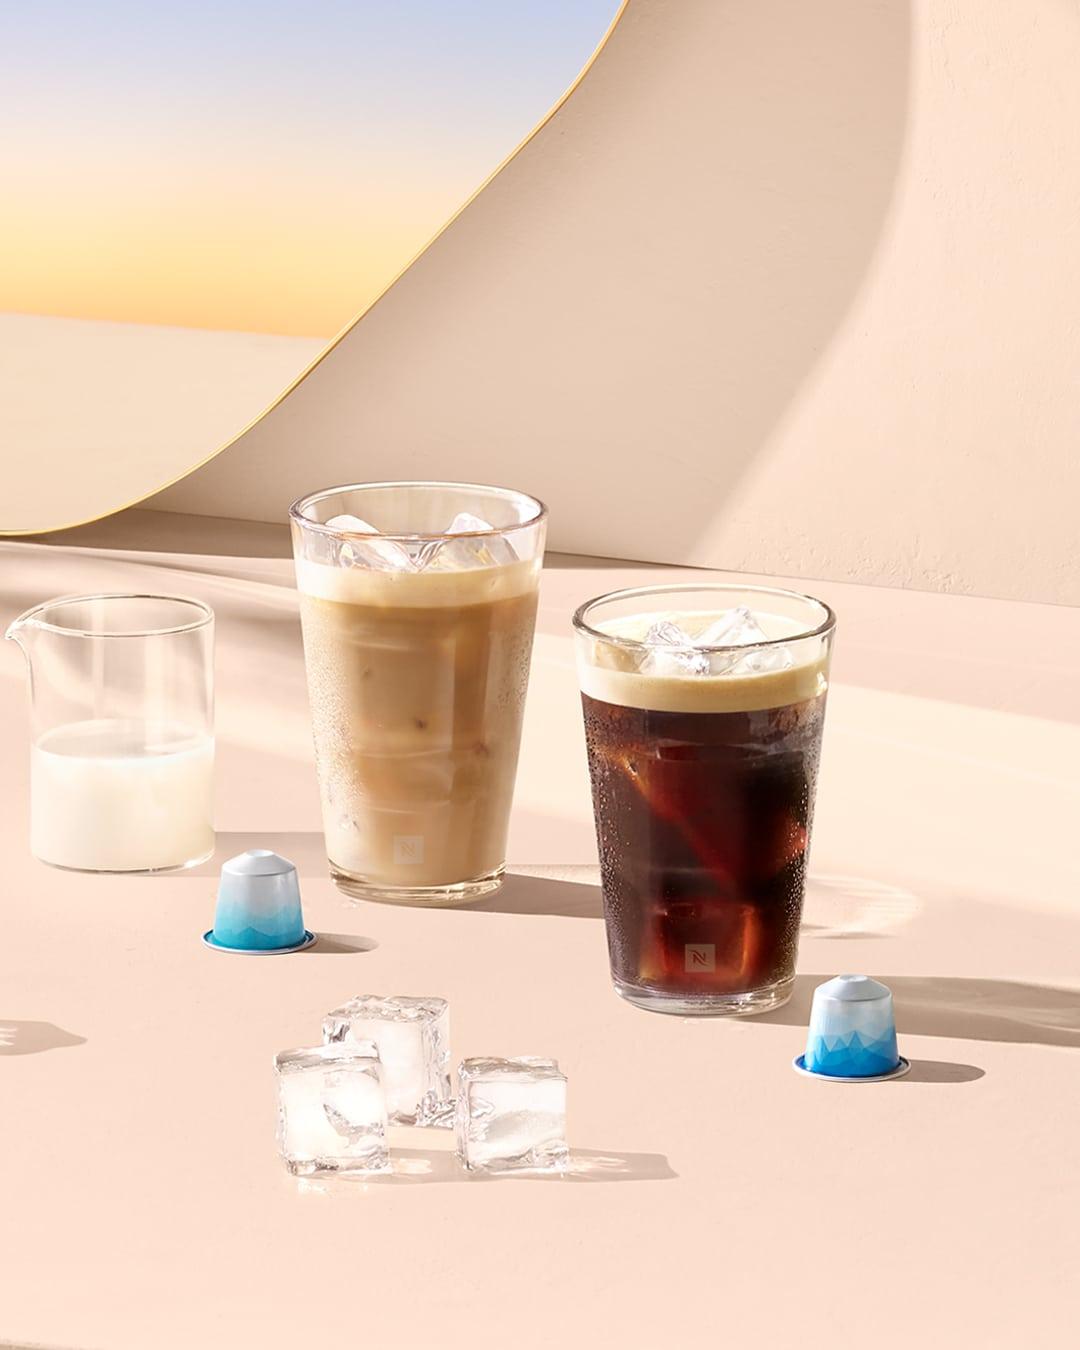 Racikan Baru Barista Creations for Ice Dari Nespresso